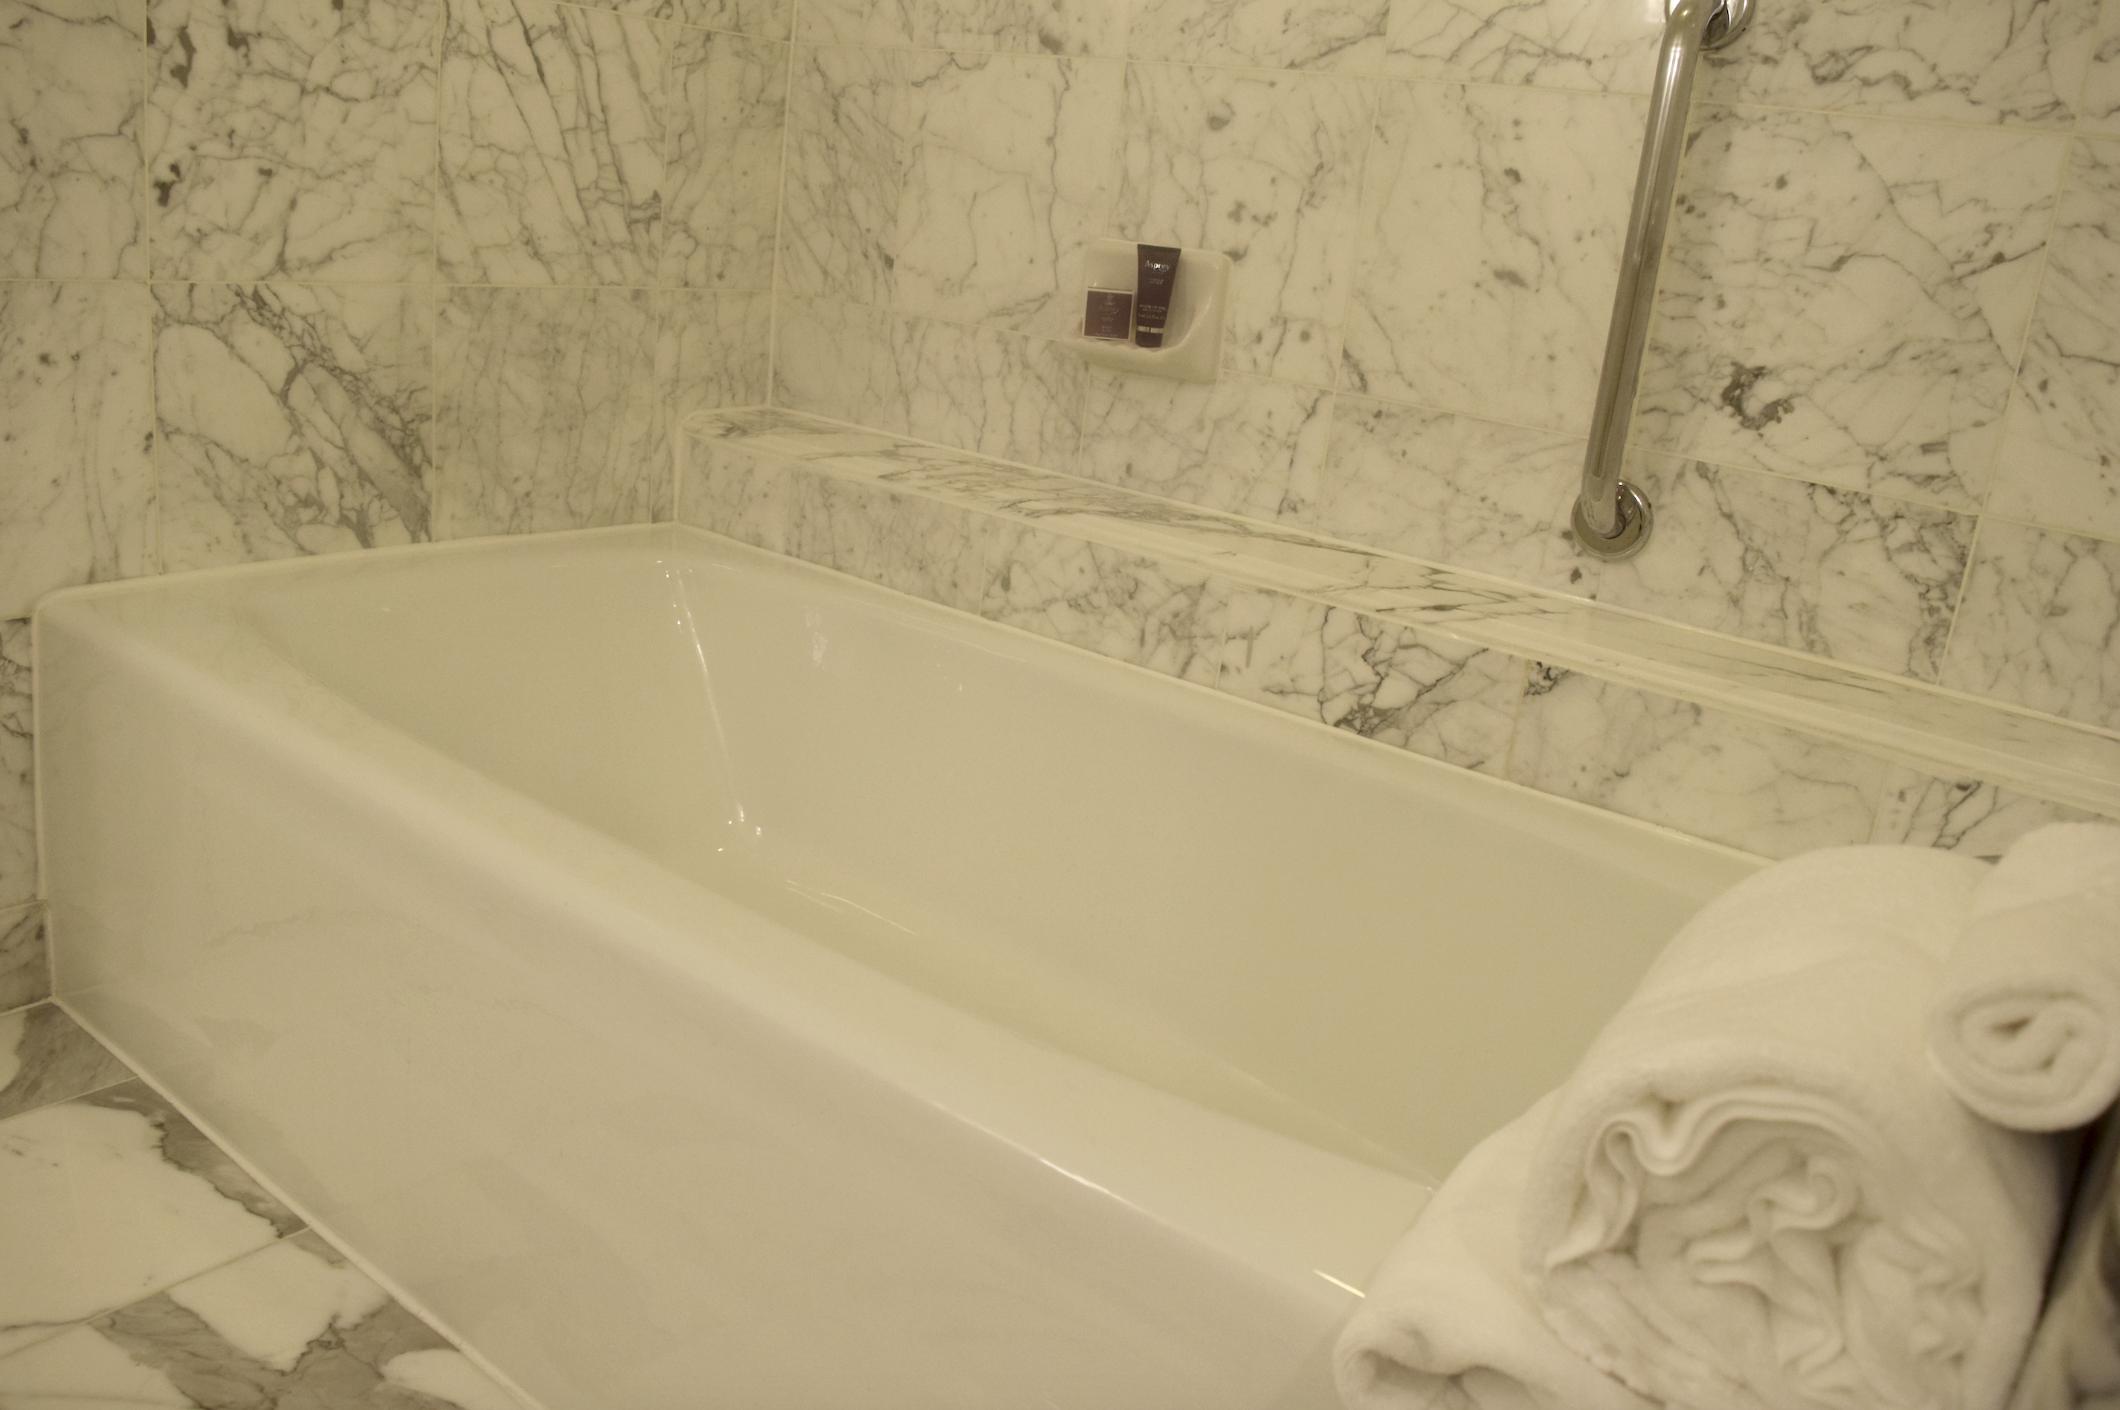 I enjoyed my long soak at this beautiful and luxurious marbled bathtub at The Ritz-Carlton, Pentagon City!